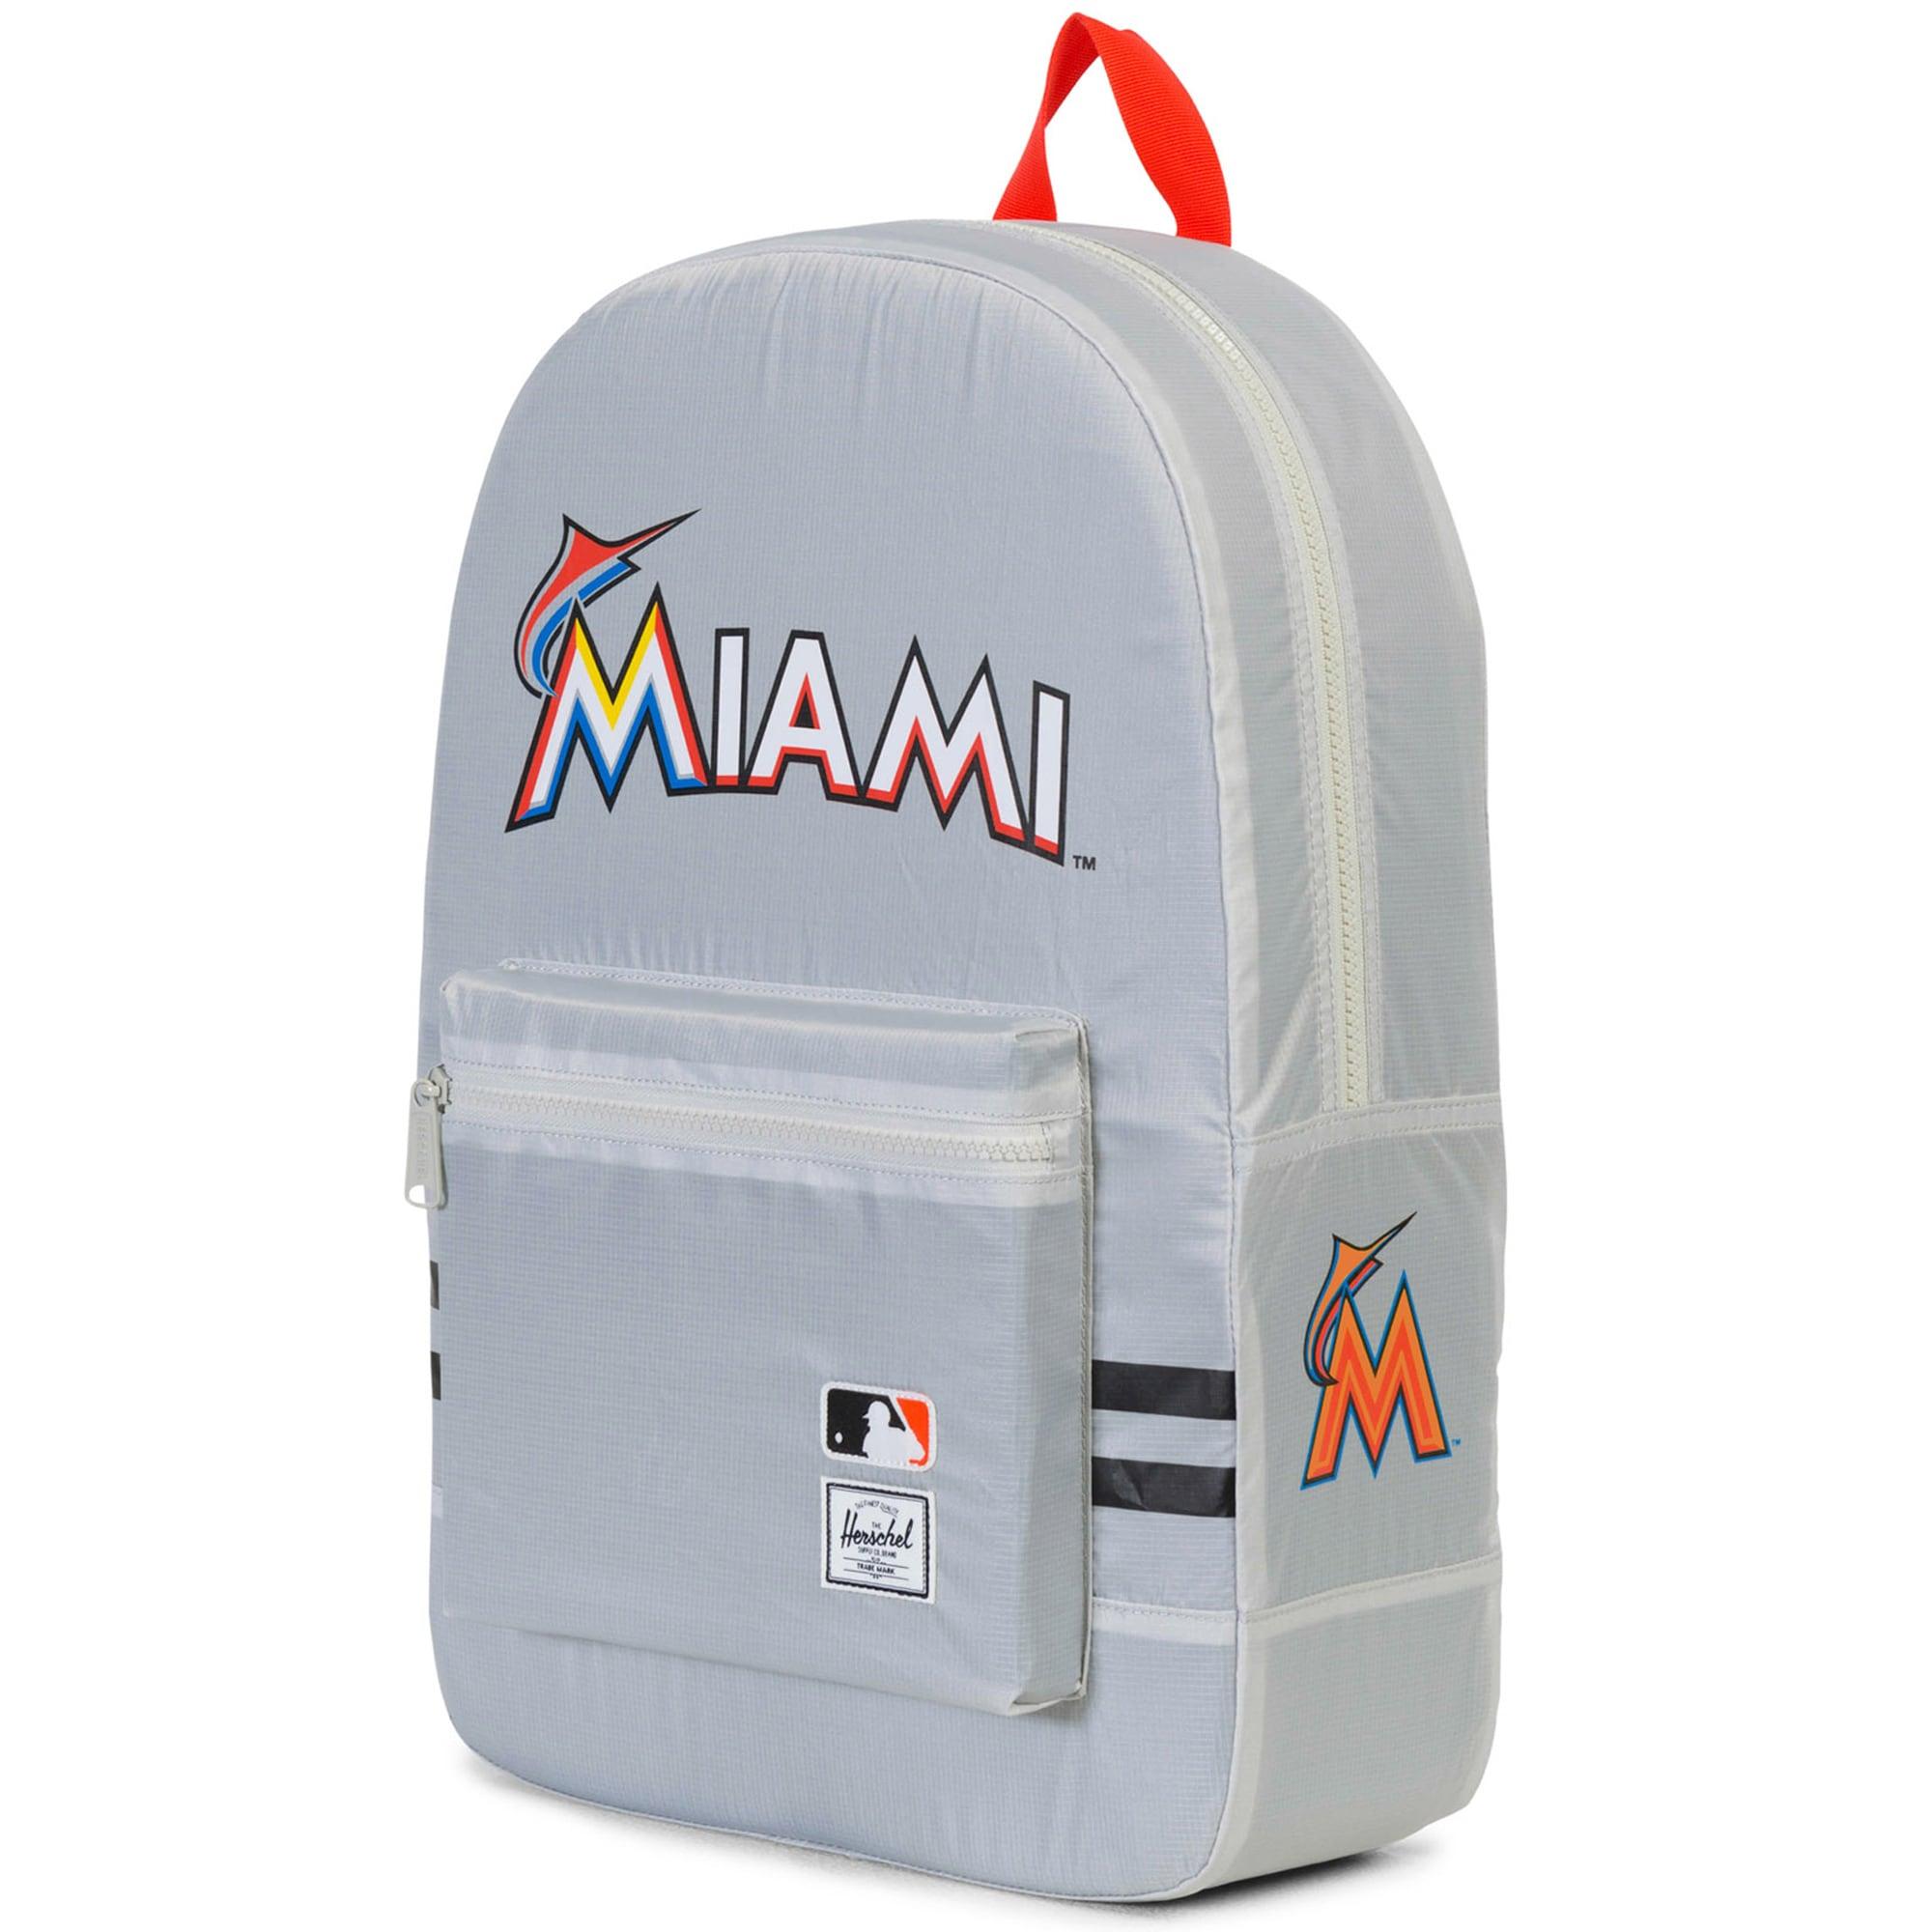 Miami Marlins Herschel Supply Co. Packable Daypack